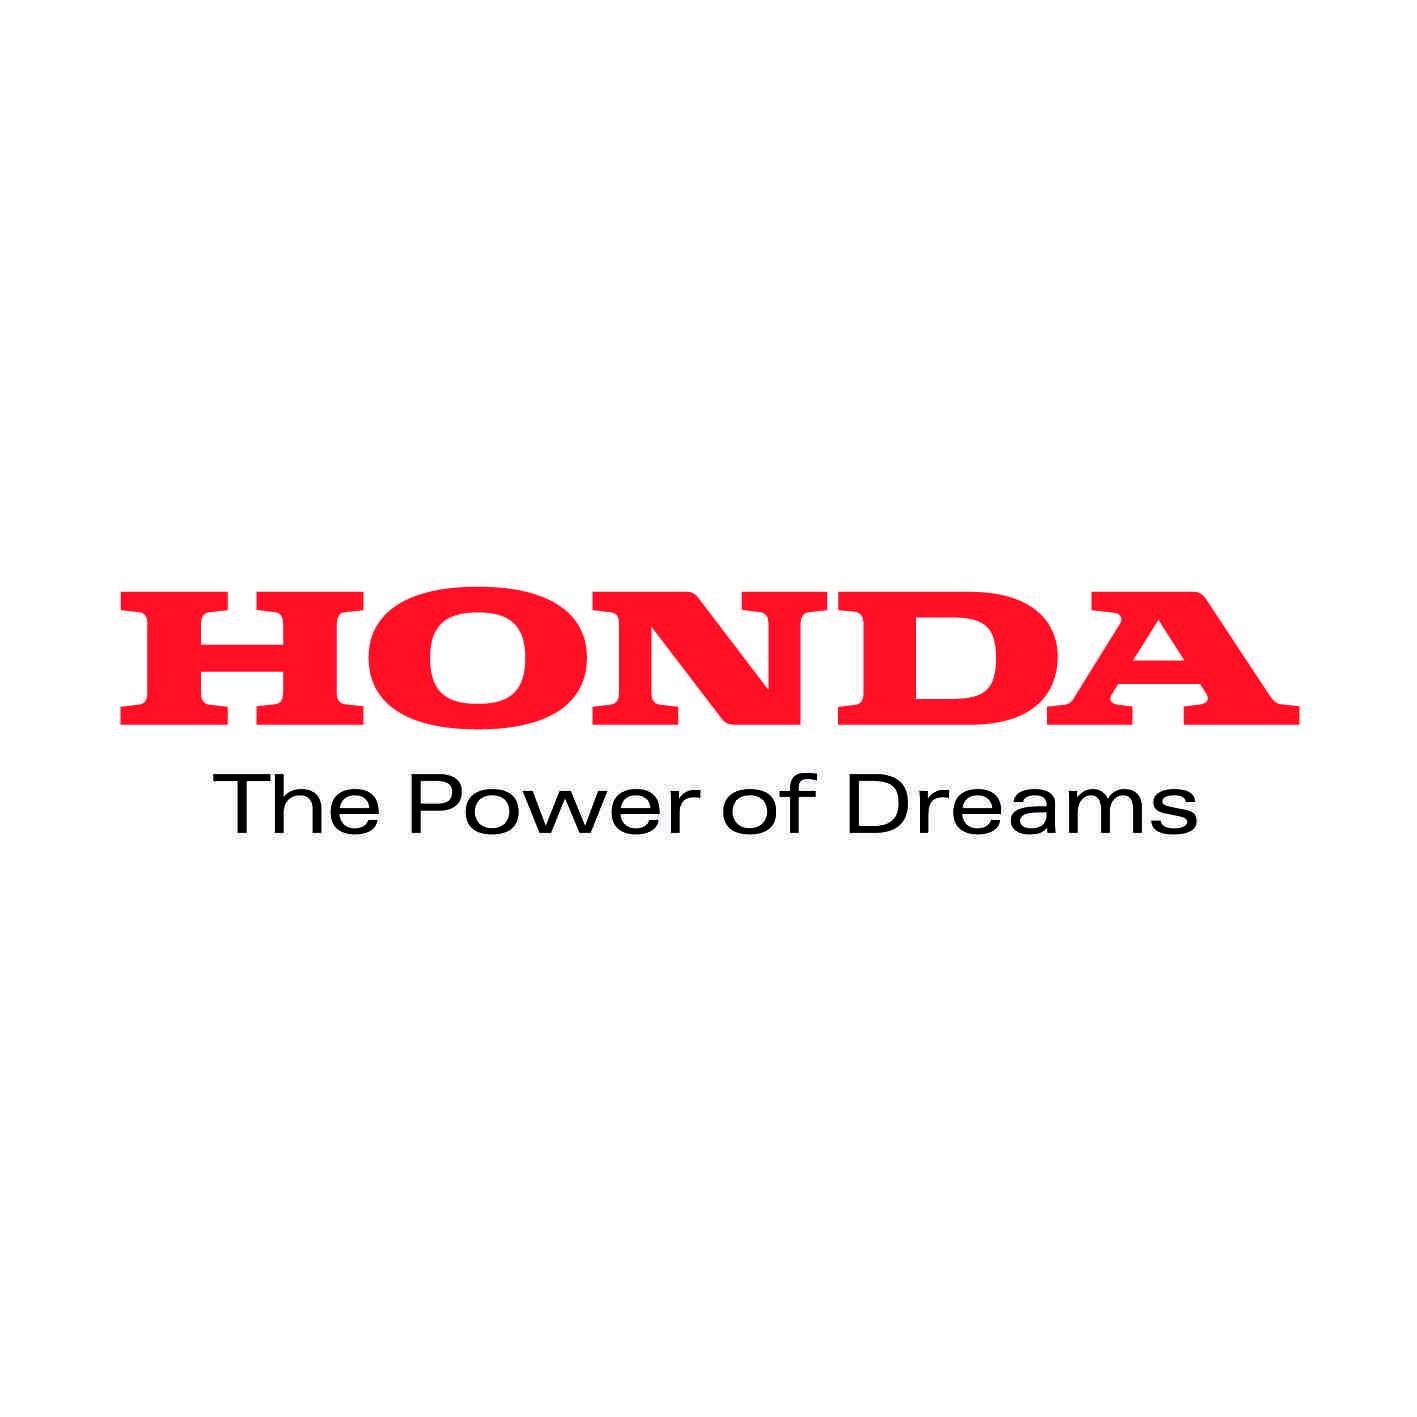 honda-ref4-stickers-moto-casque-scooter-sticker-autocollant-adhesifs